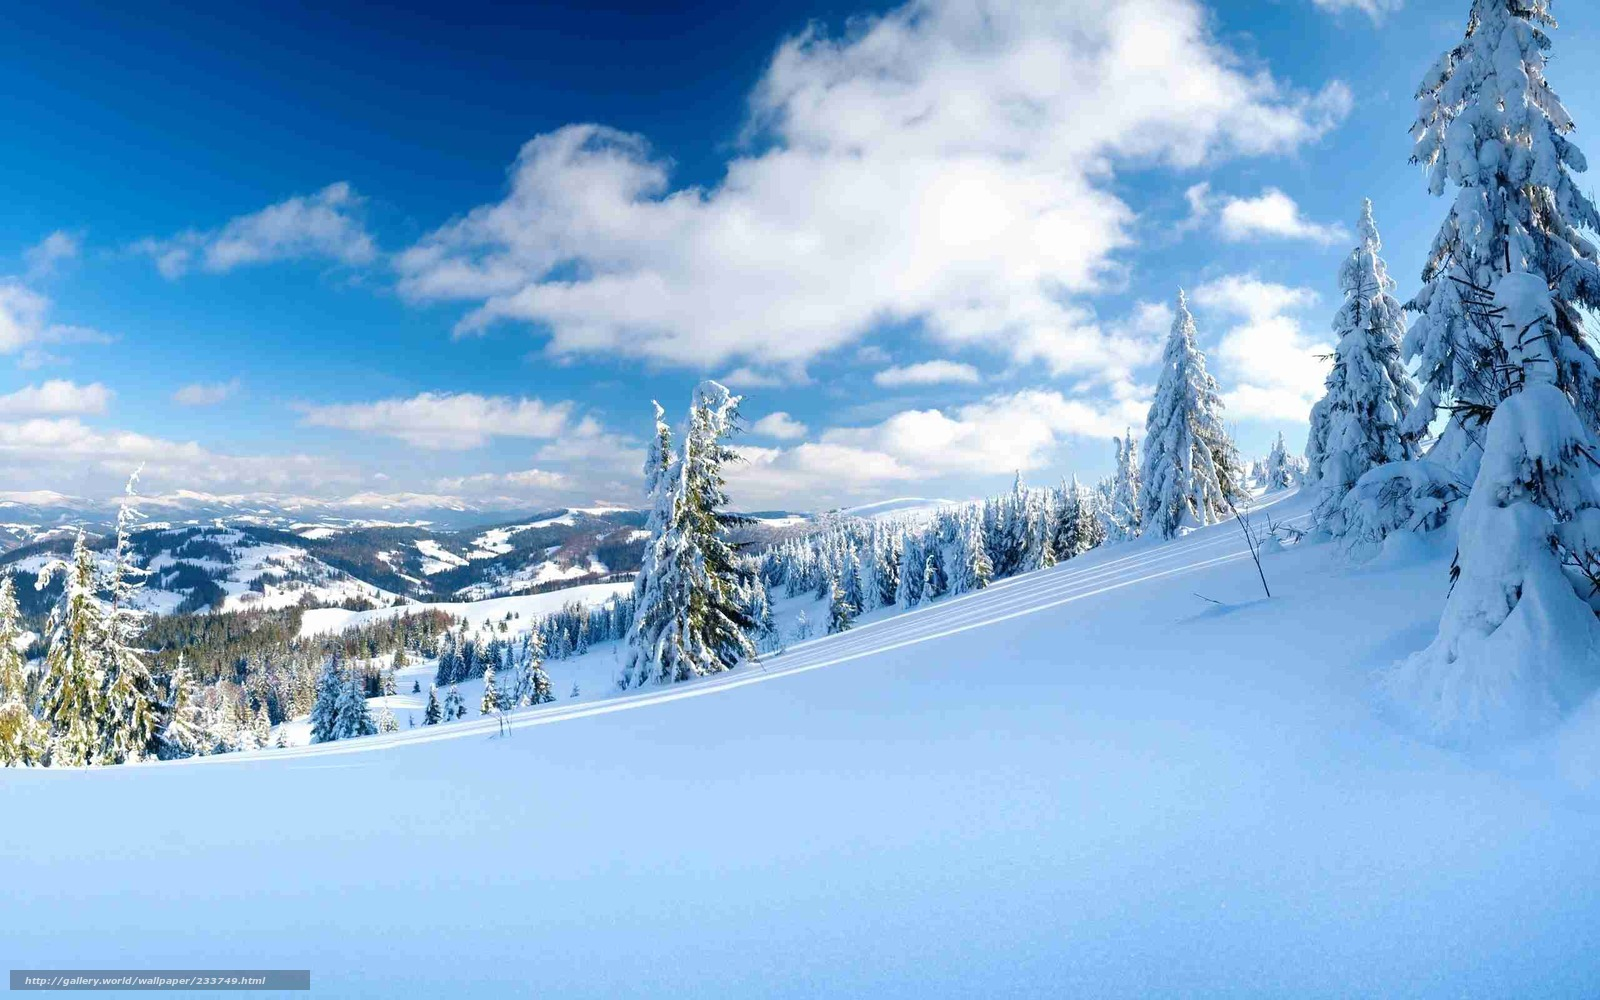 пейзажи, склоны, природа, фото, облака, снег, зимние обои, зима ...